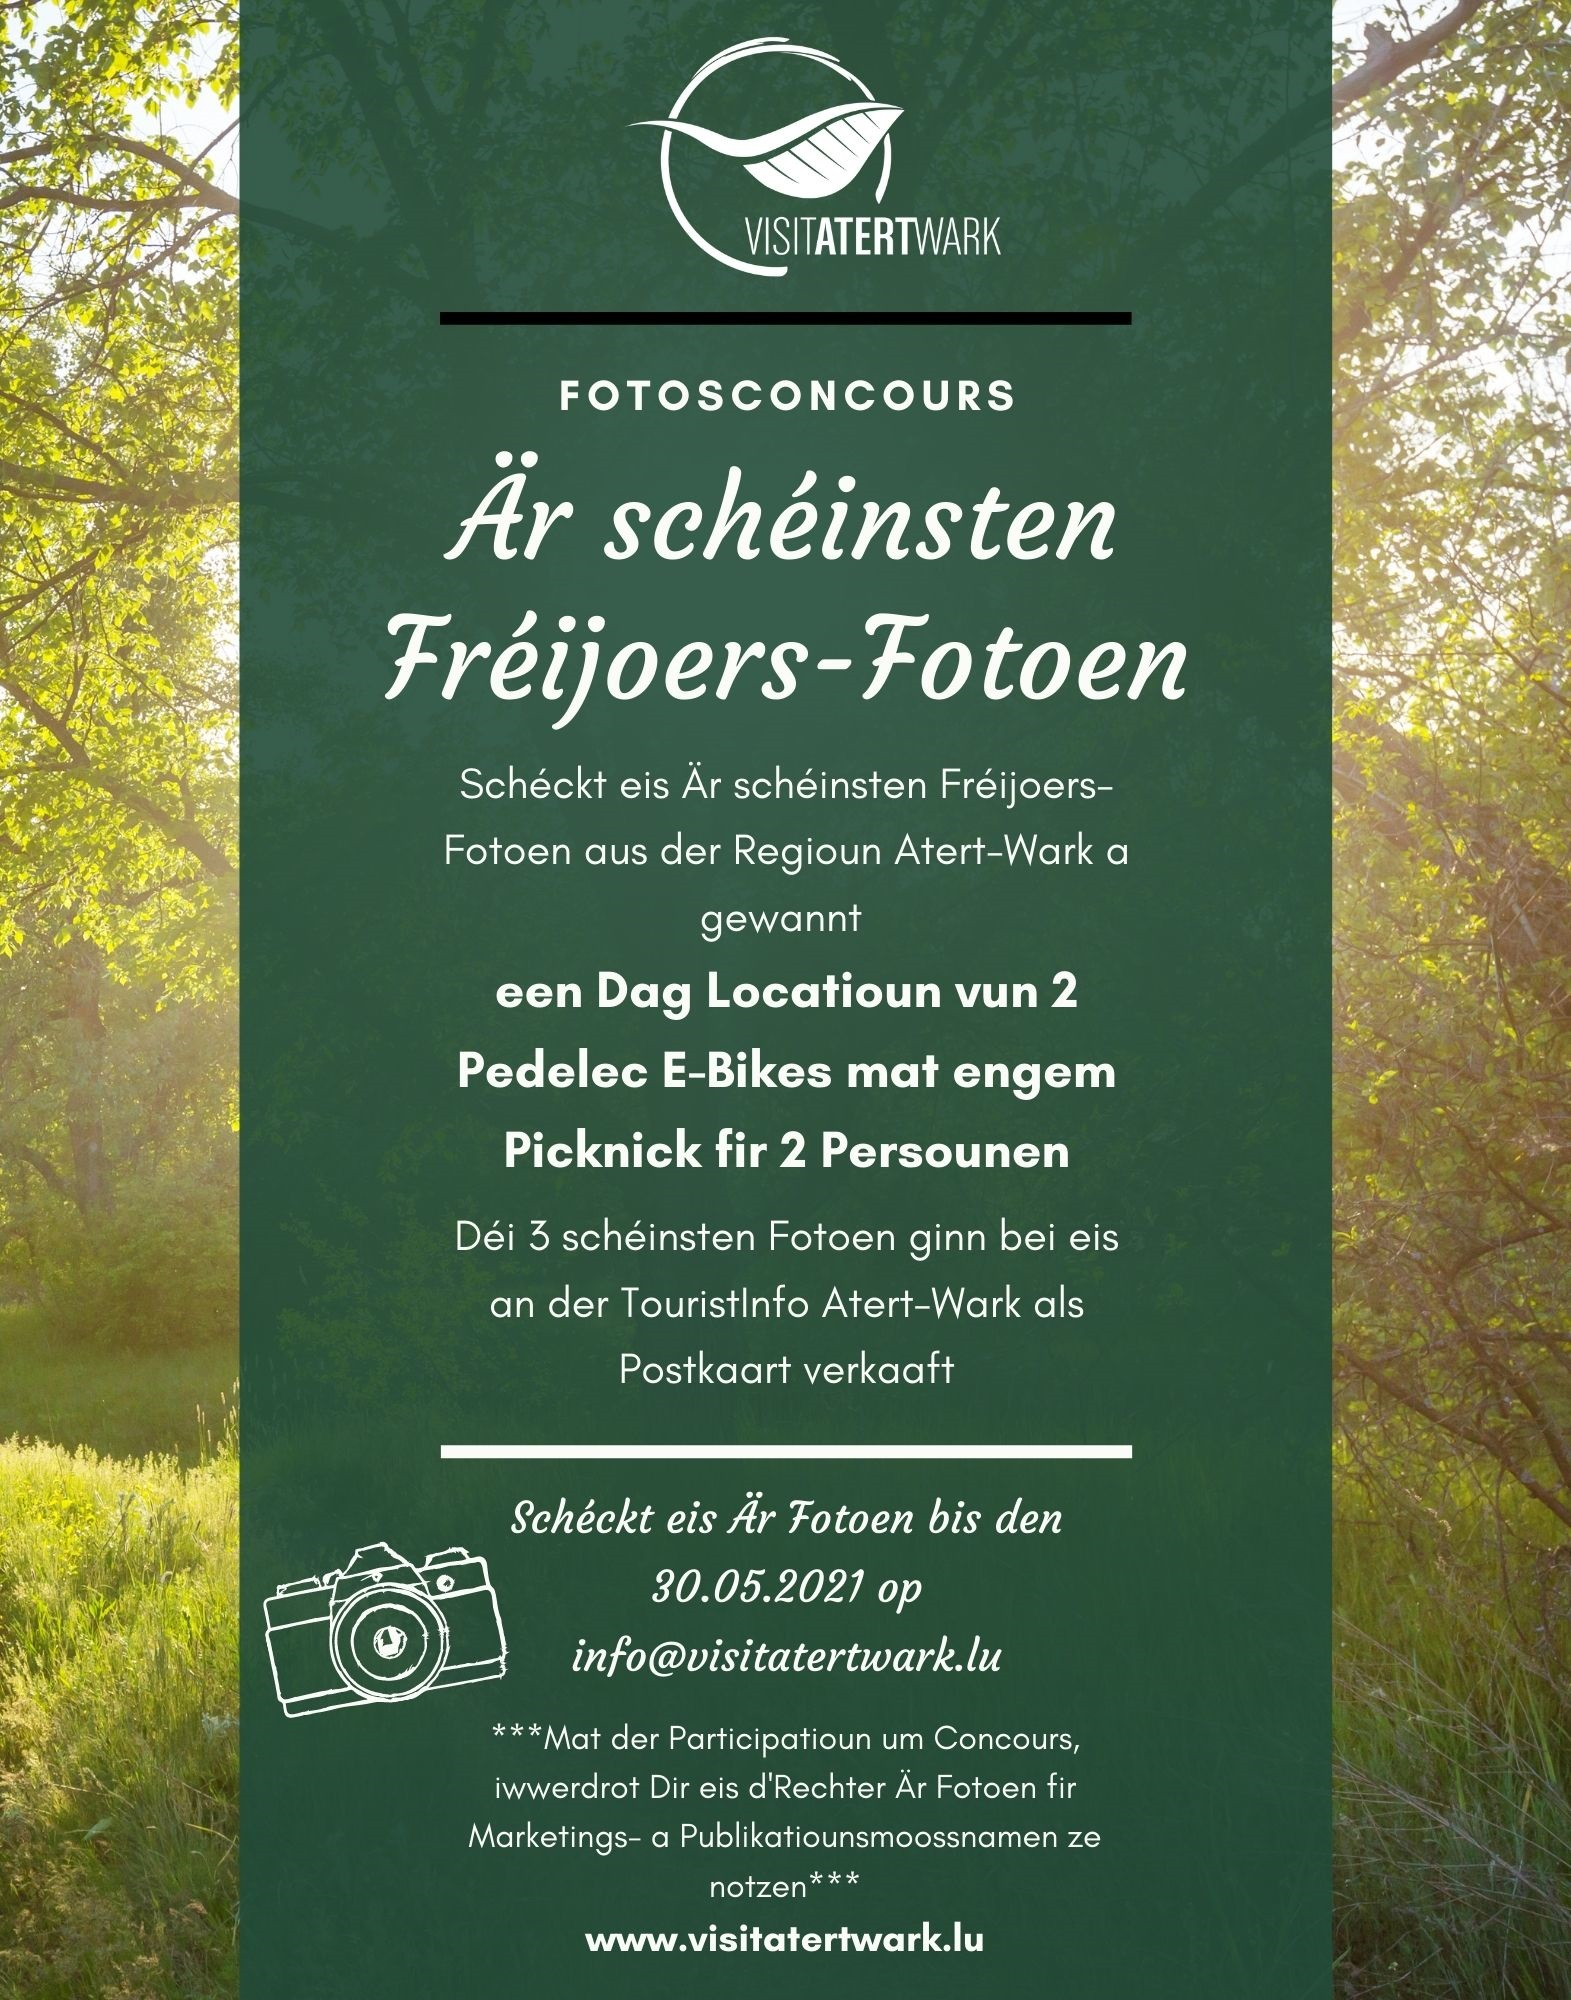 Fotoconcours Visit AtertWark